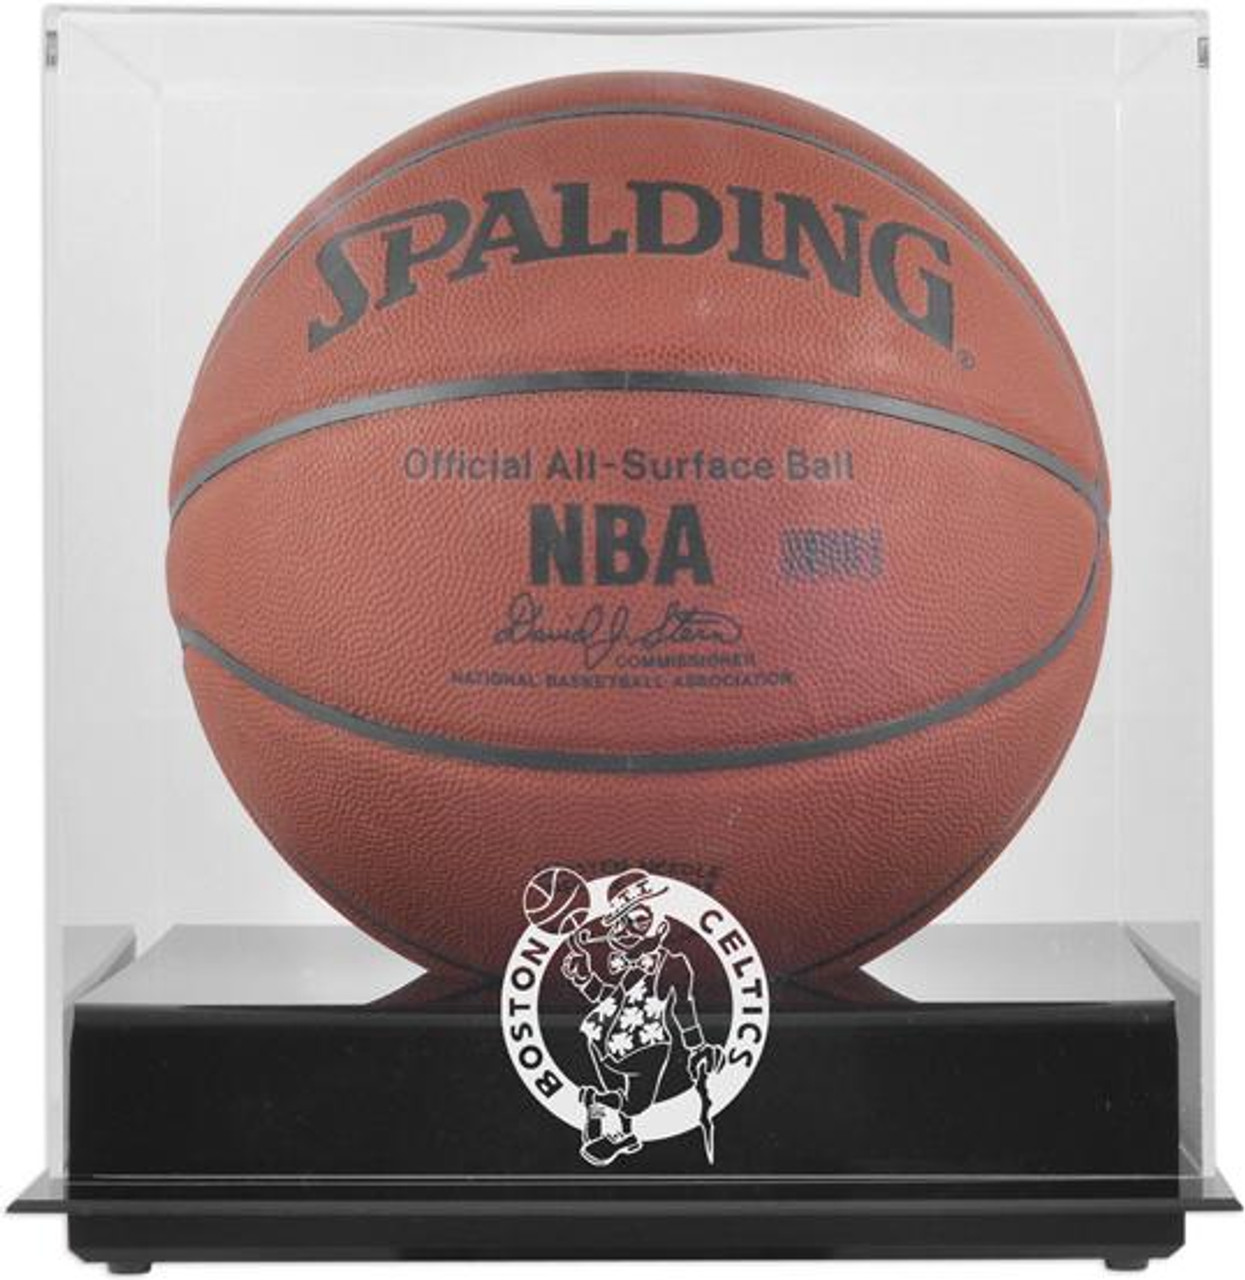 Boston Celtics Blackbase Basketball Display Case